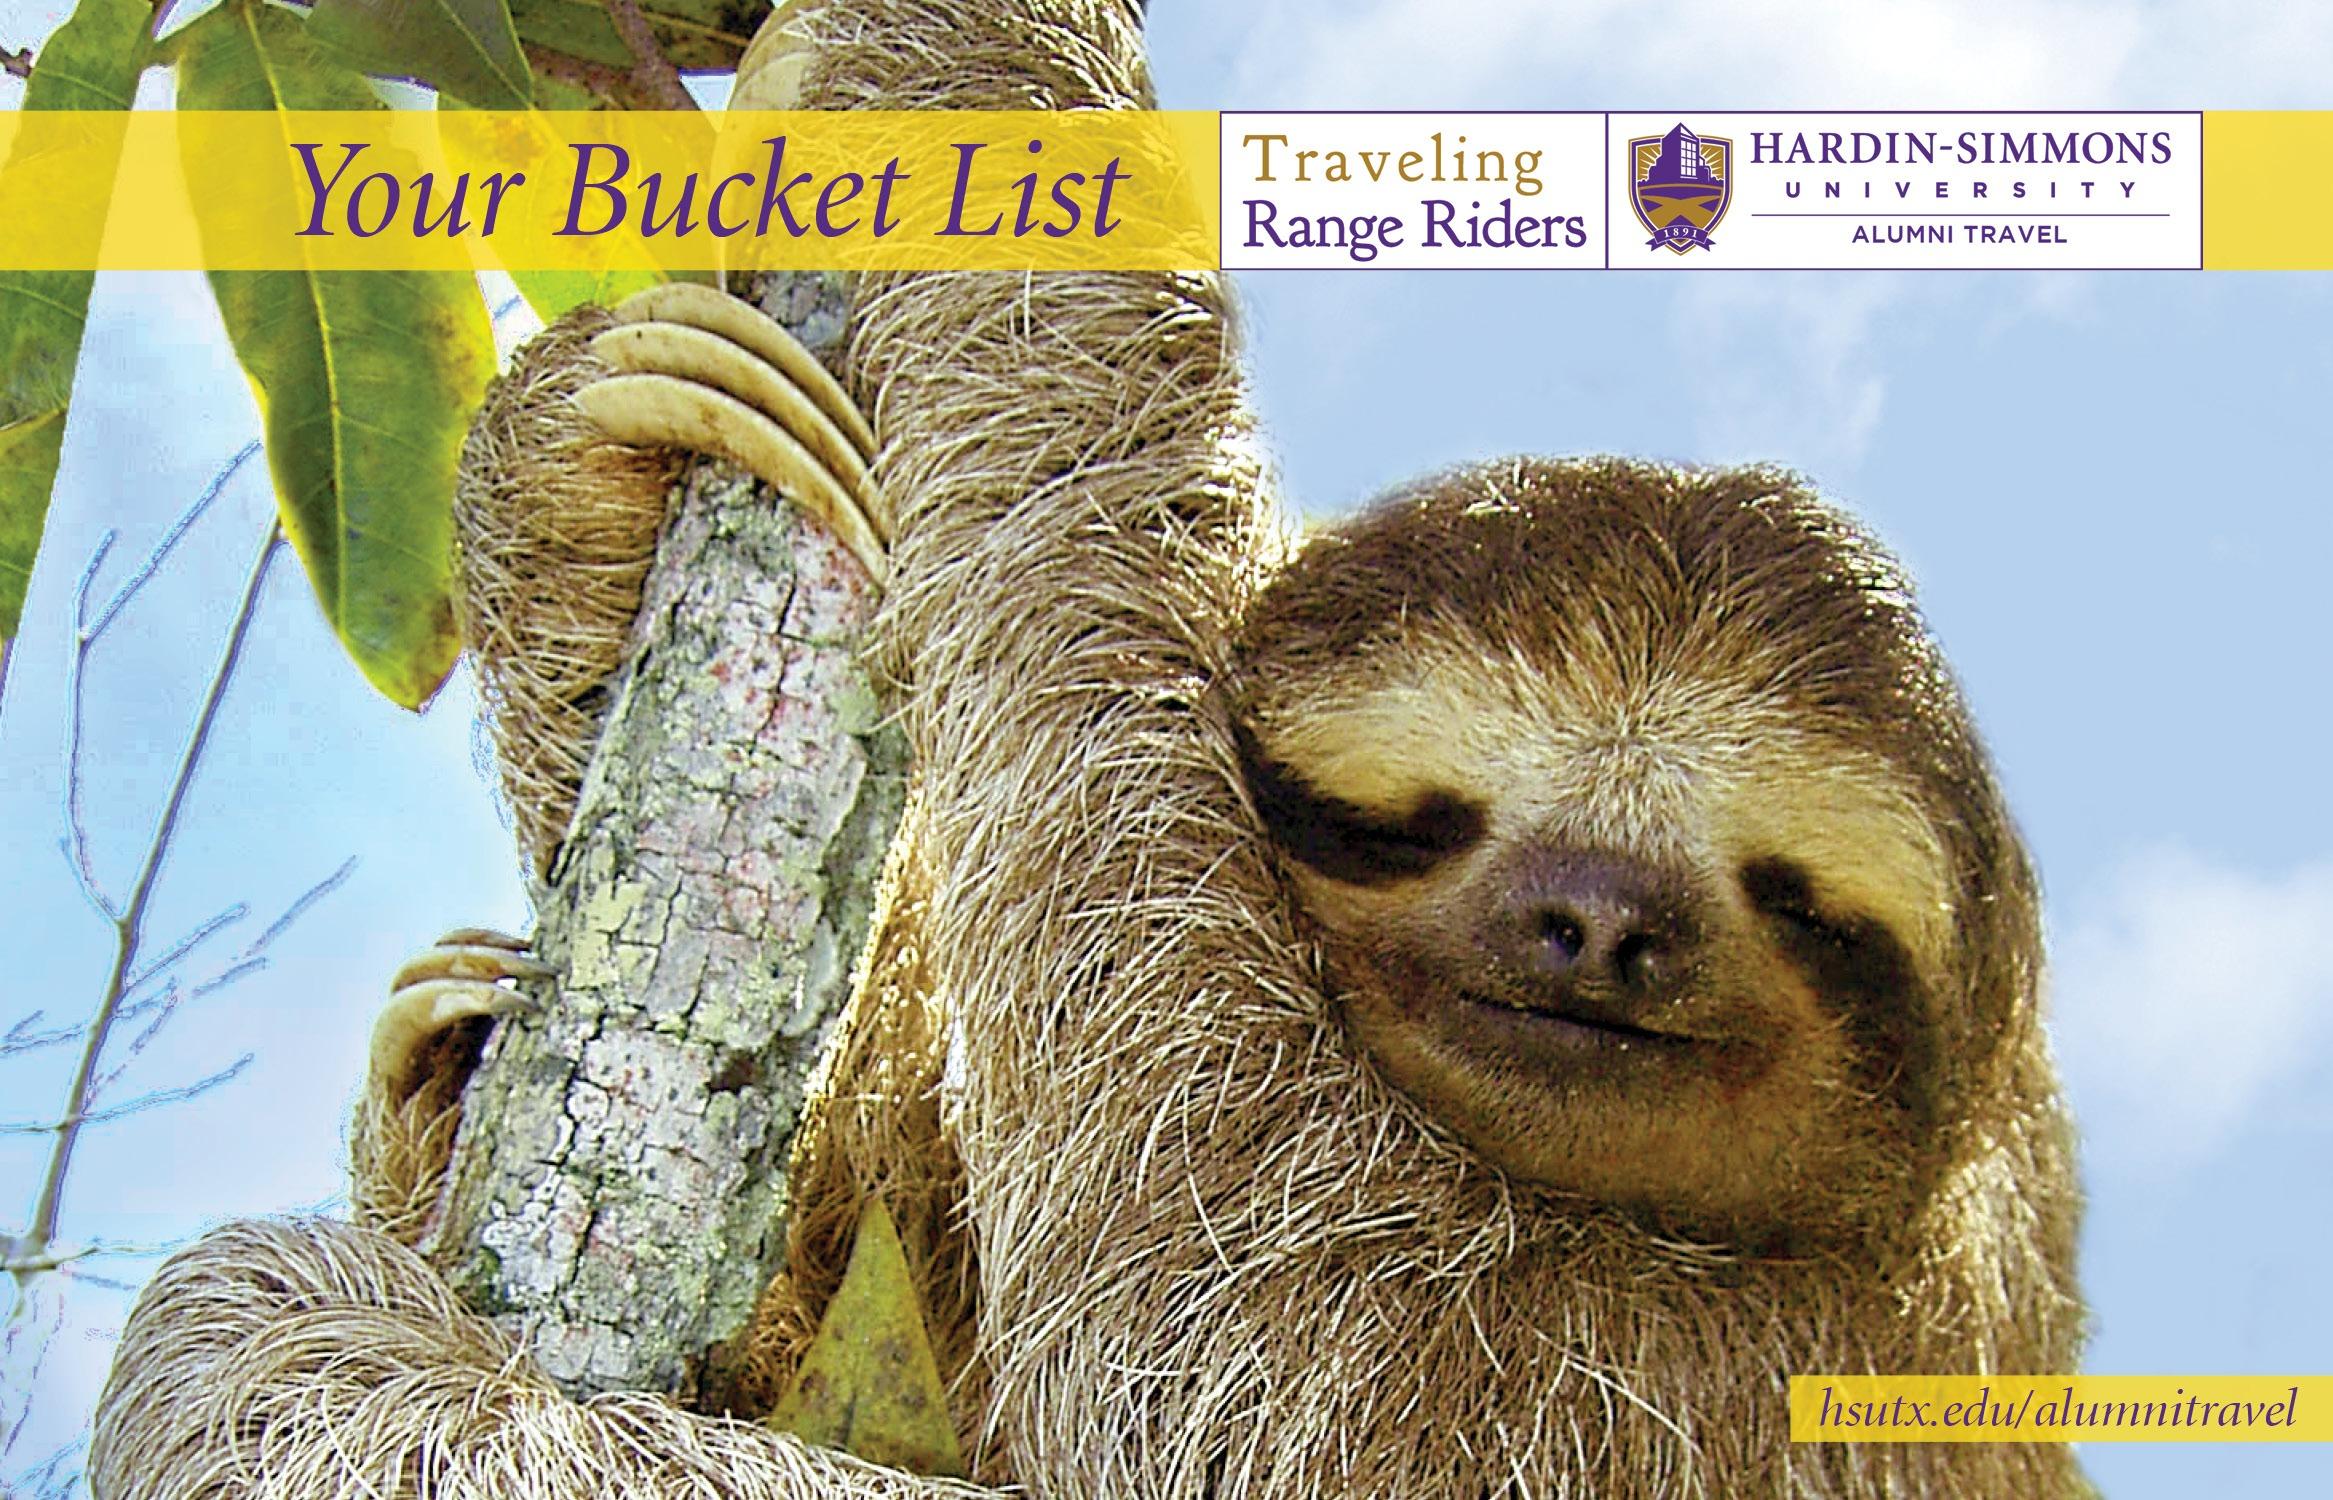 Hsu Traveling Range Riders | Hardin-Simmons University throughout August 2021 Calendar Hsu